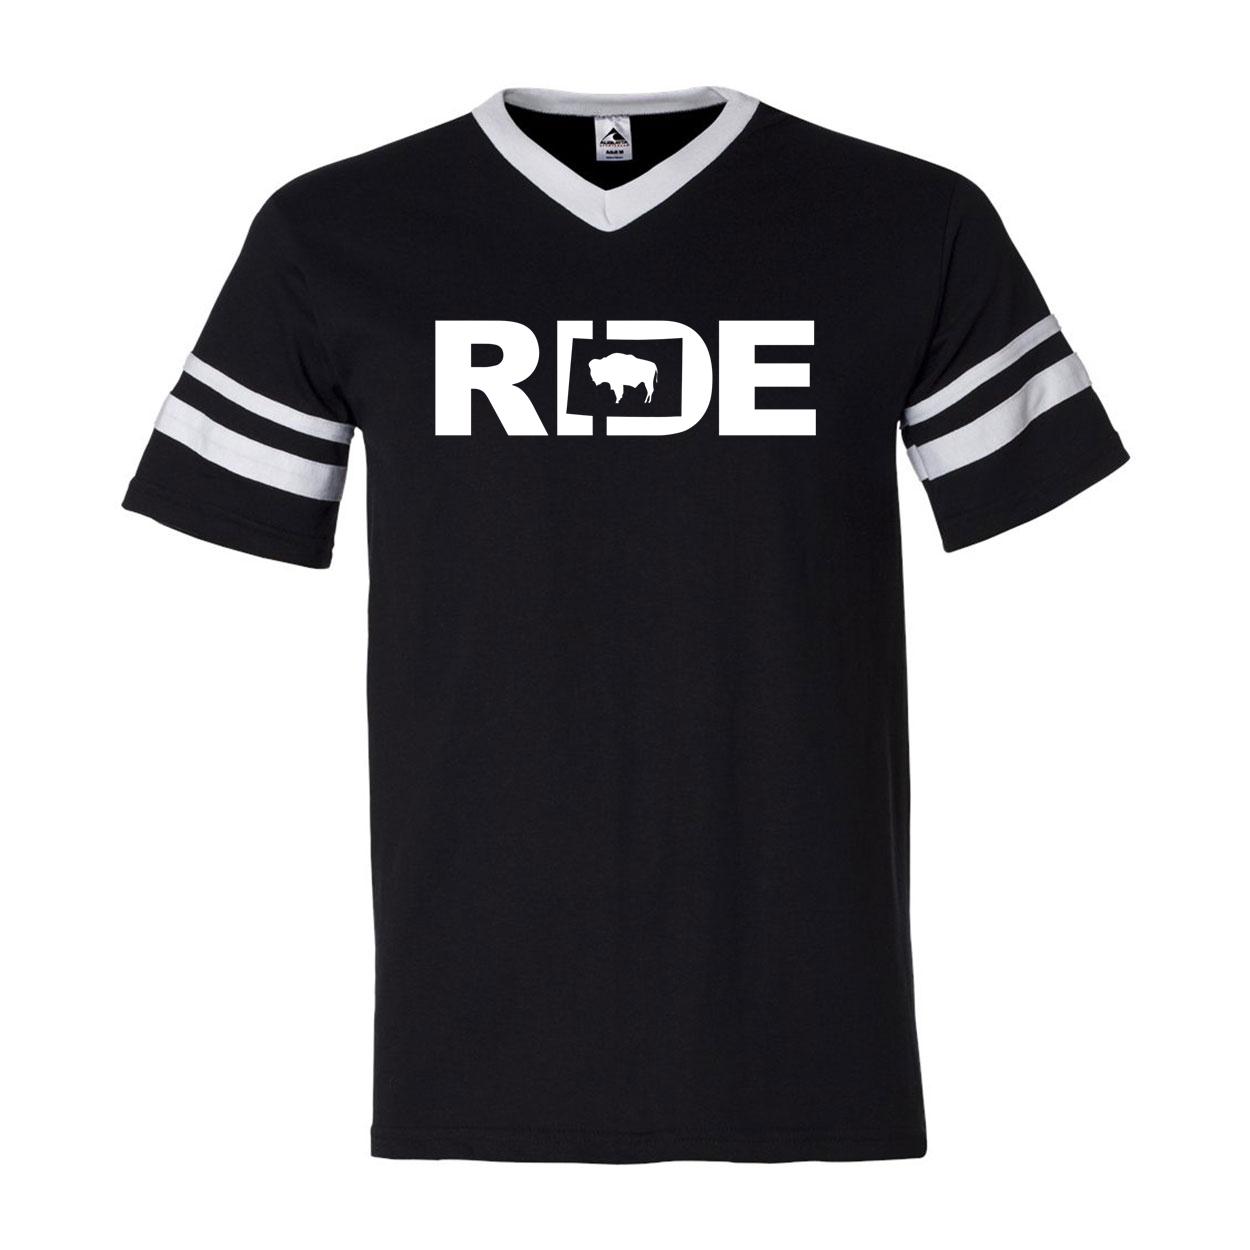 Ride Wyoming Classic Premium Striped Jersey T-Shirt Black/White (White Logo)